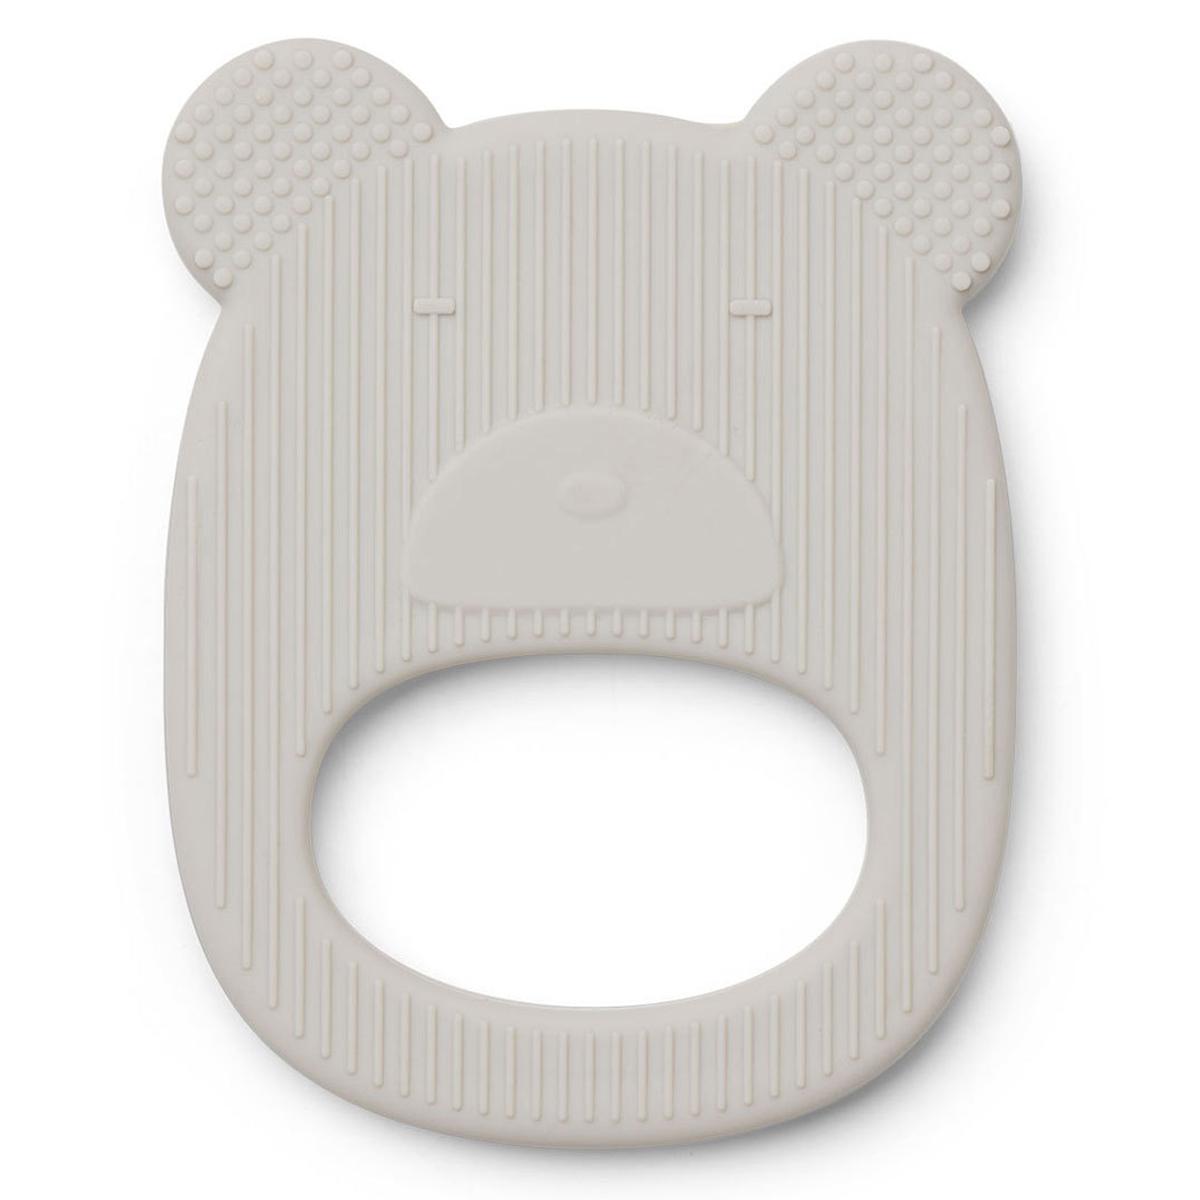 Dentition Anneau de Dentition Gemma Mr. Bear - Dumbo Grey Anneau de Dentition Gemma Mr. Bear - Dumbo Grey